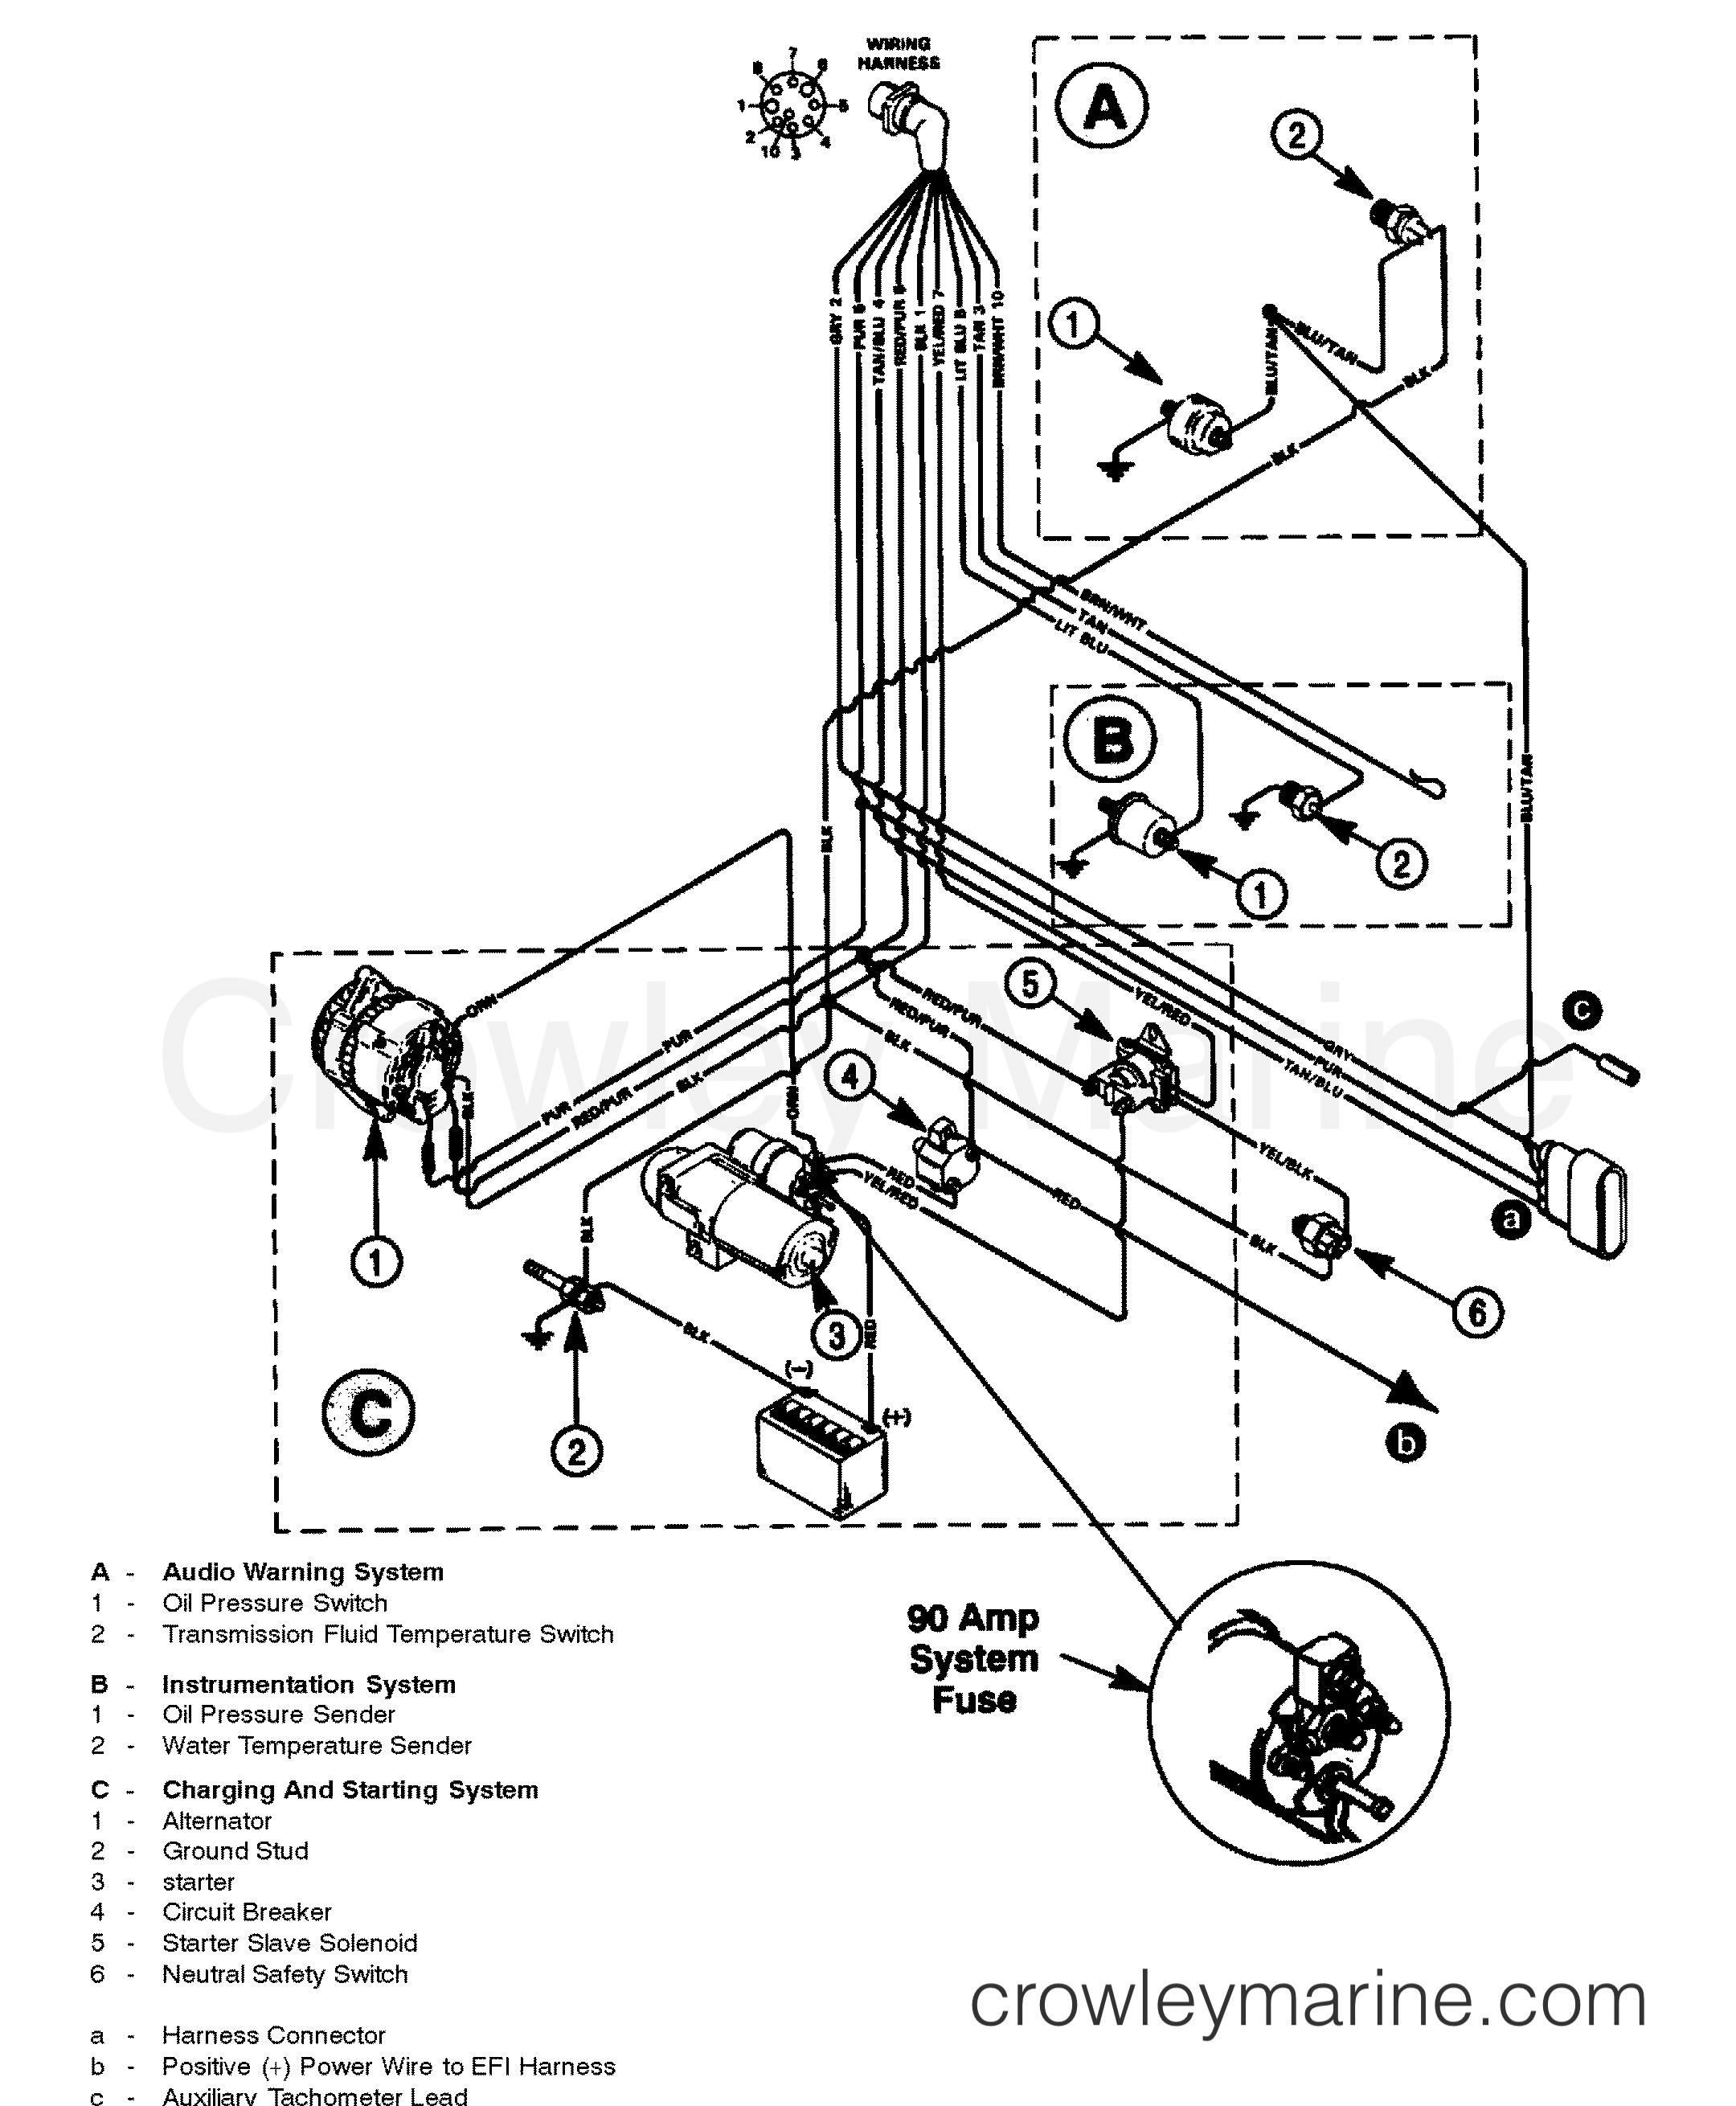 WIRING HARNESS (ENGINE) - 1997 Mercury Inboard Engine 350TBI ... on 1997 mercury cougar neutral safety switch, 1997 mercury cougar parts, 99 mercury cougar wiring diagram, 1997 mercury cougar battery, 1999 mercury mountaineer wiring diagram, 1998 mercury mystique wiring diagram, 1991 mercury capri wiring diagram, 1997 mercury mountaineer fuse box diagram, fuel pump wiring harness diagram, 1997 mercury cougar antenna, 2000 mercury villager wiring diagram, 2005 mercury sable wiring diagram,